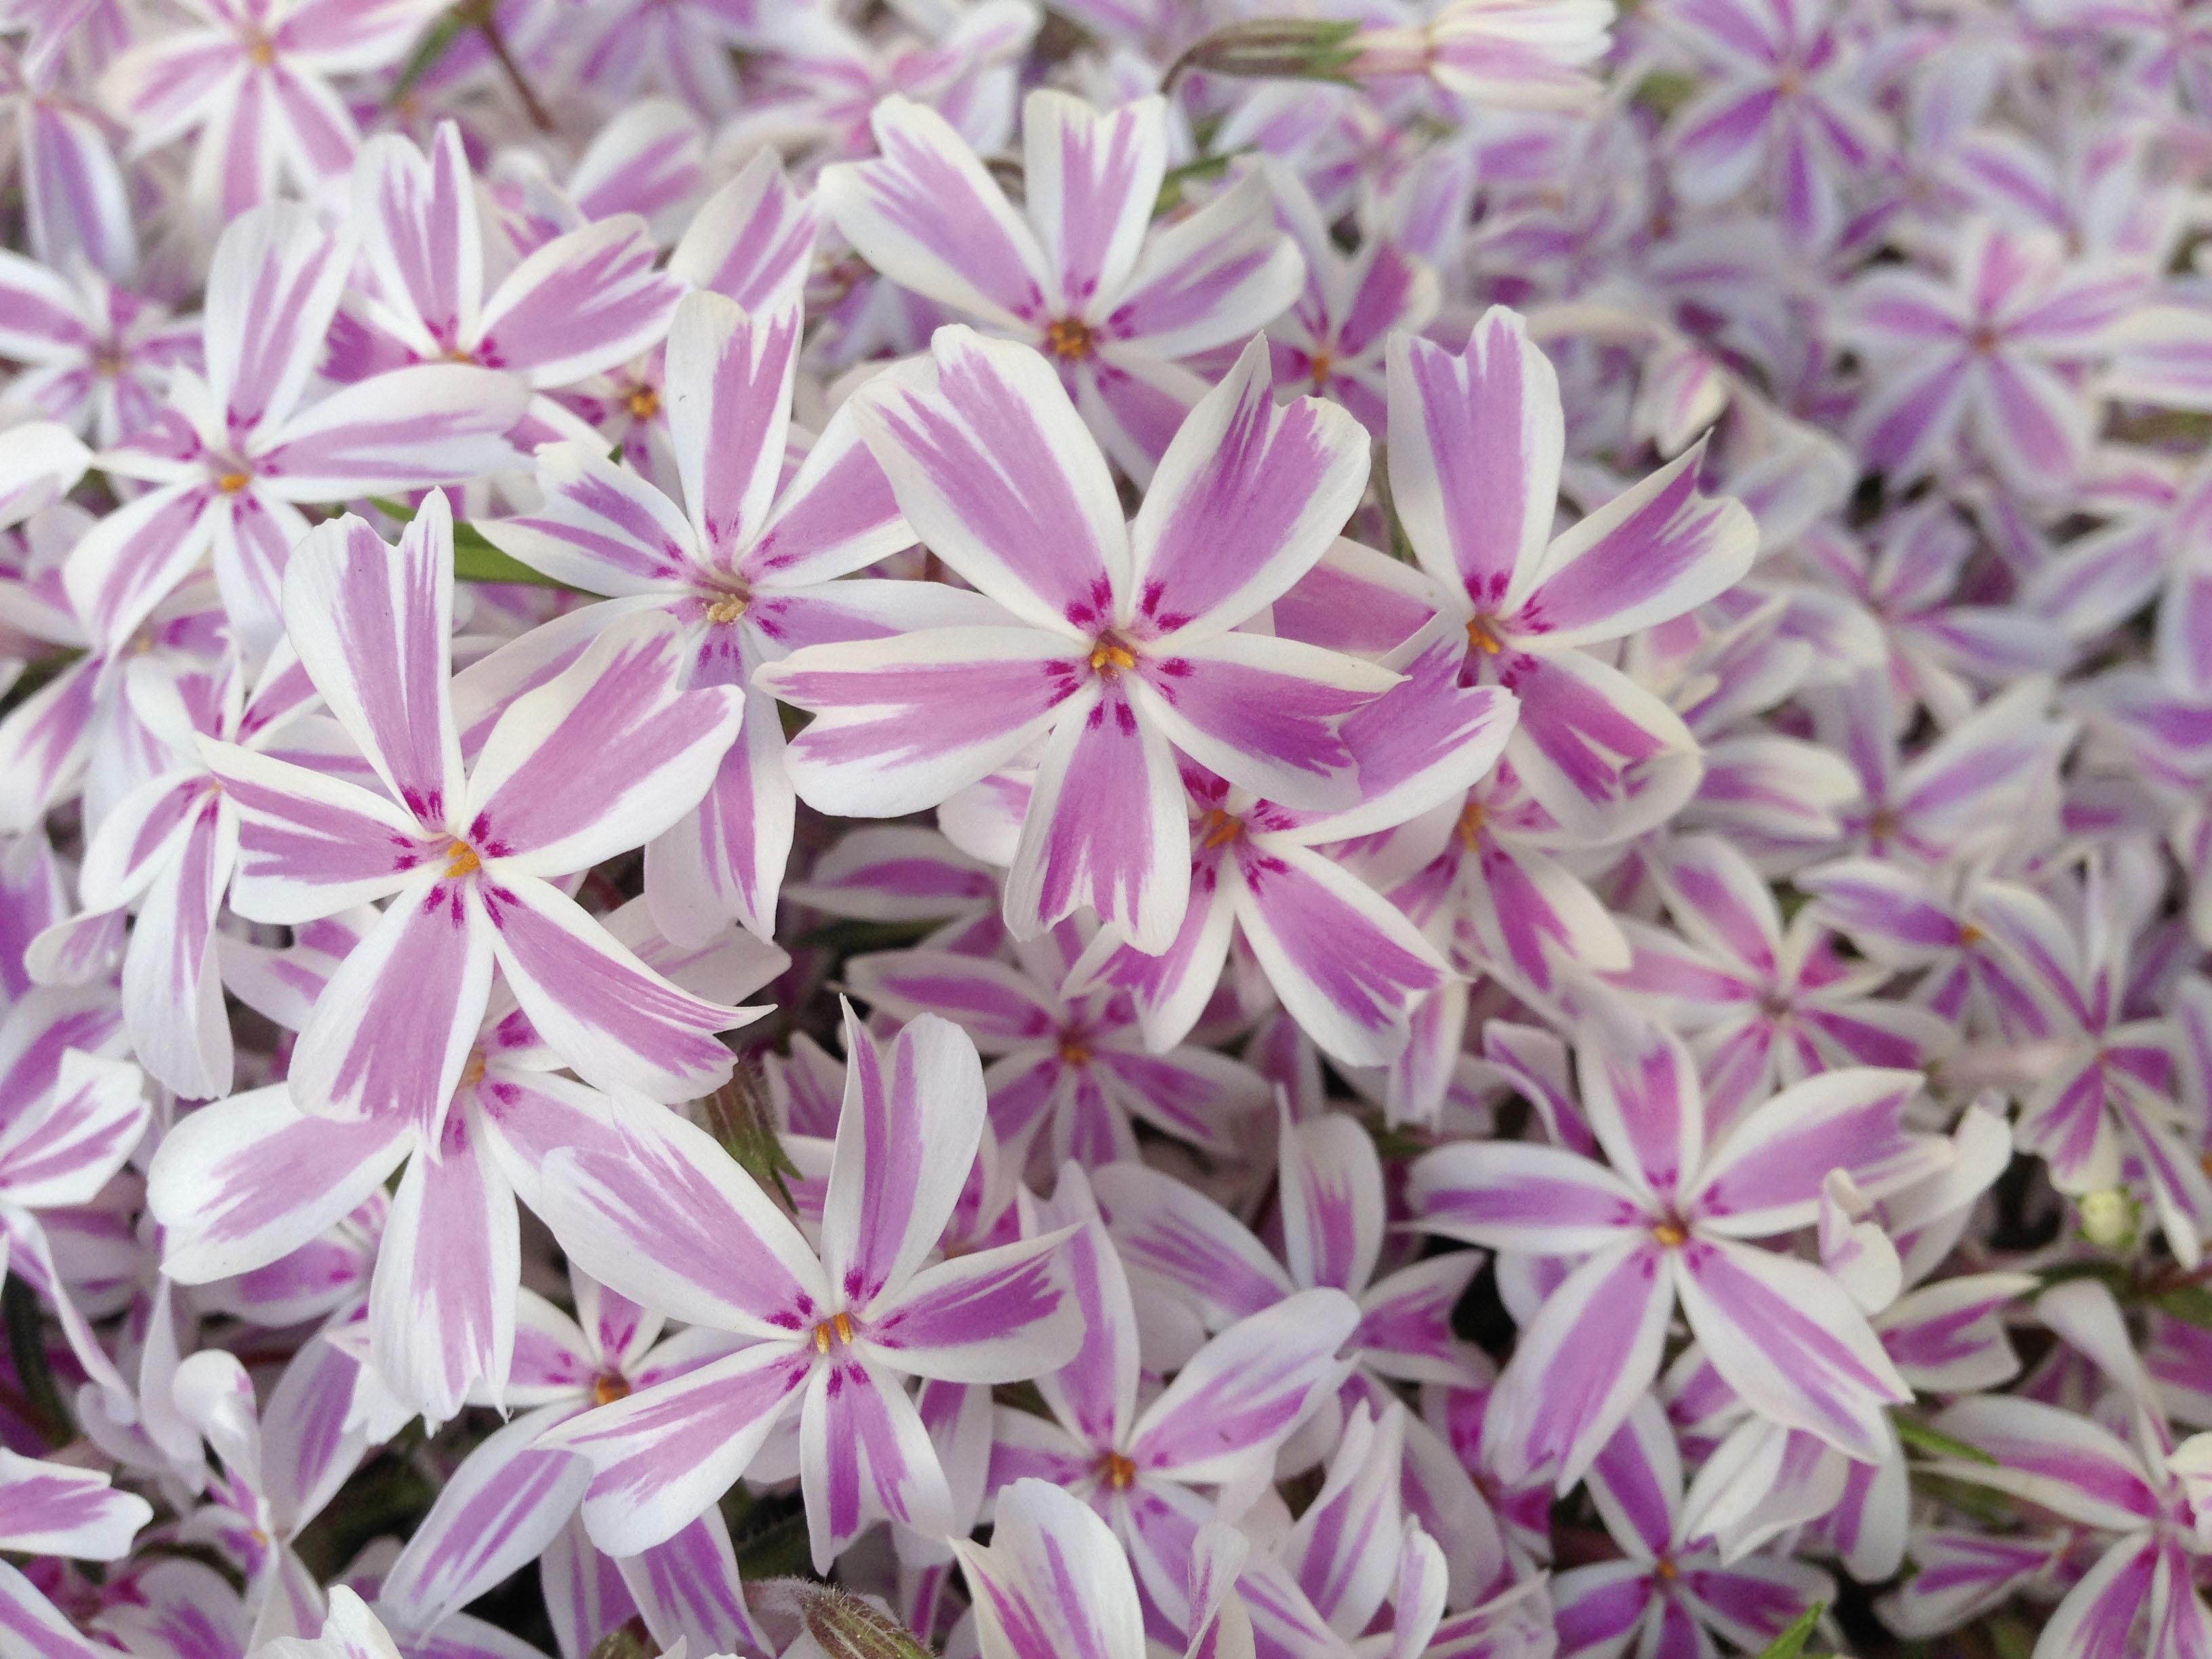 Free Images White Petal Botany Pink Flora Striped Wildflower